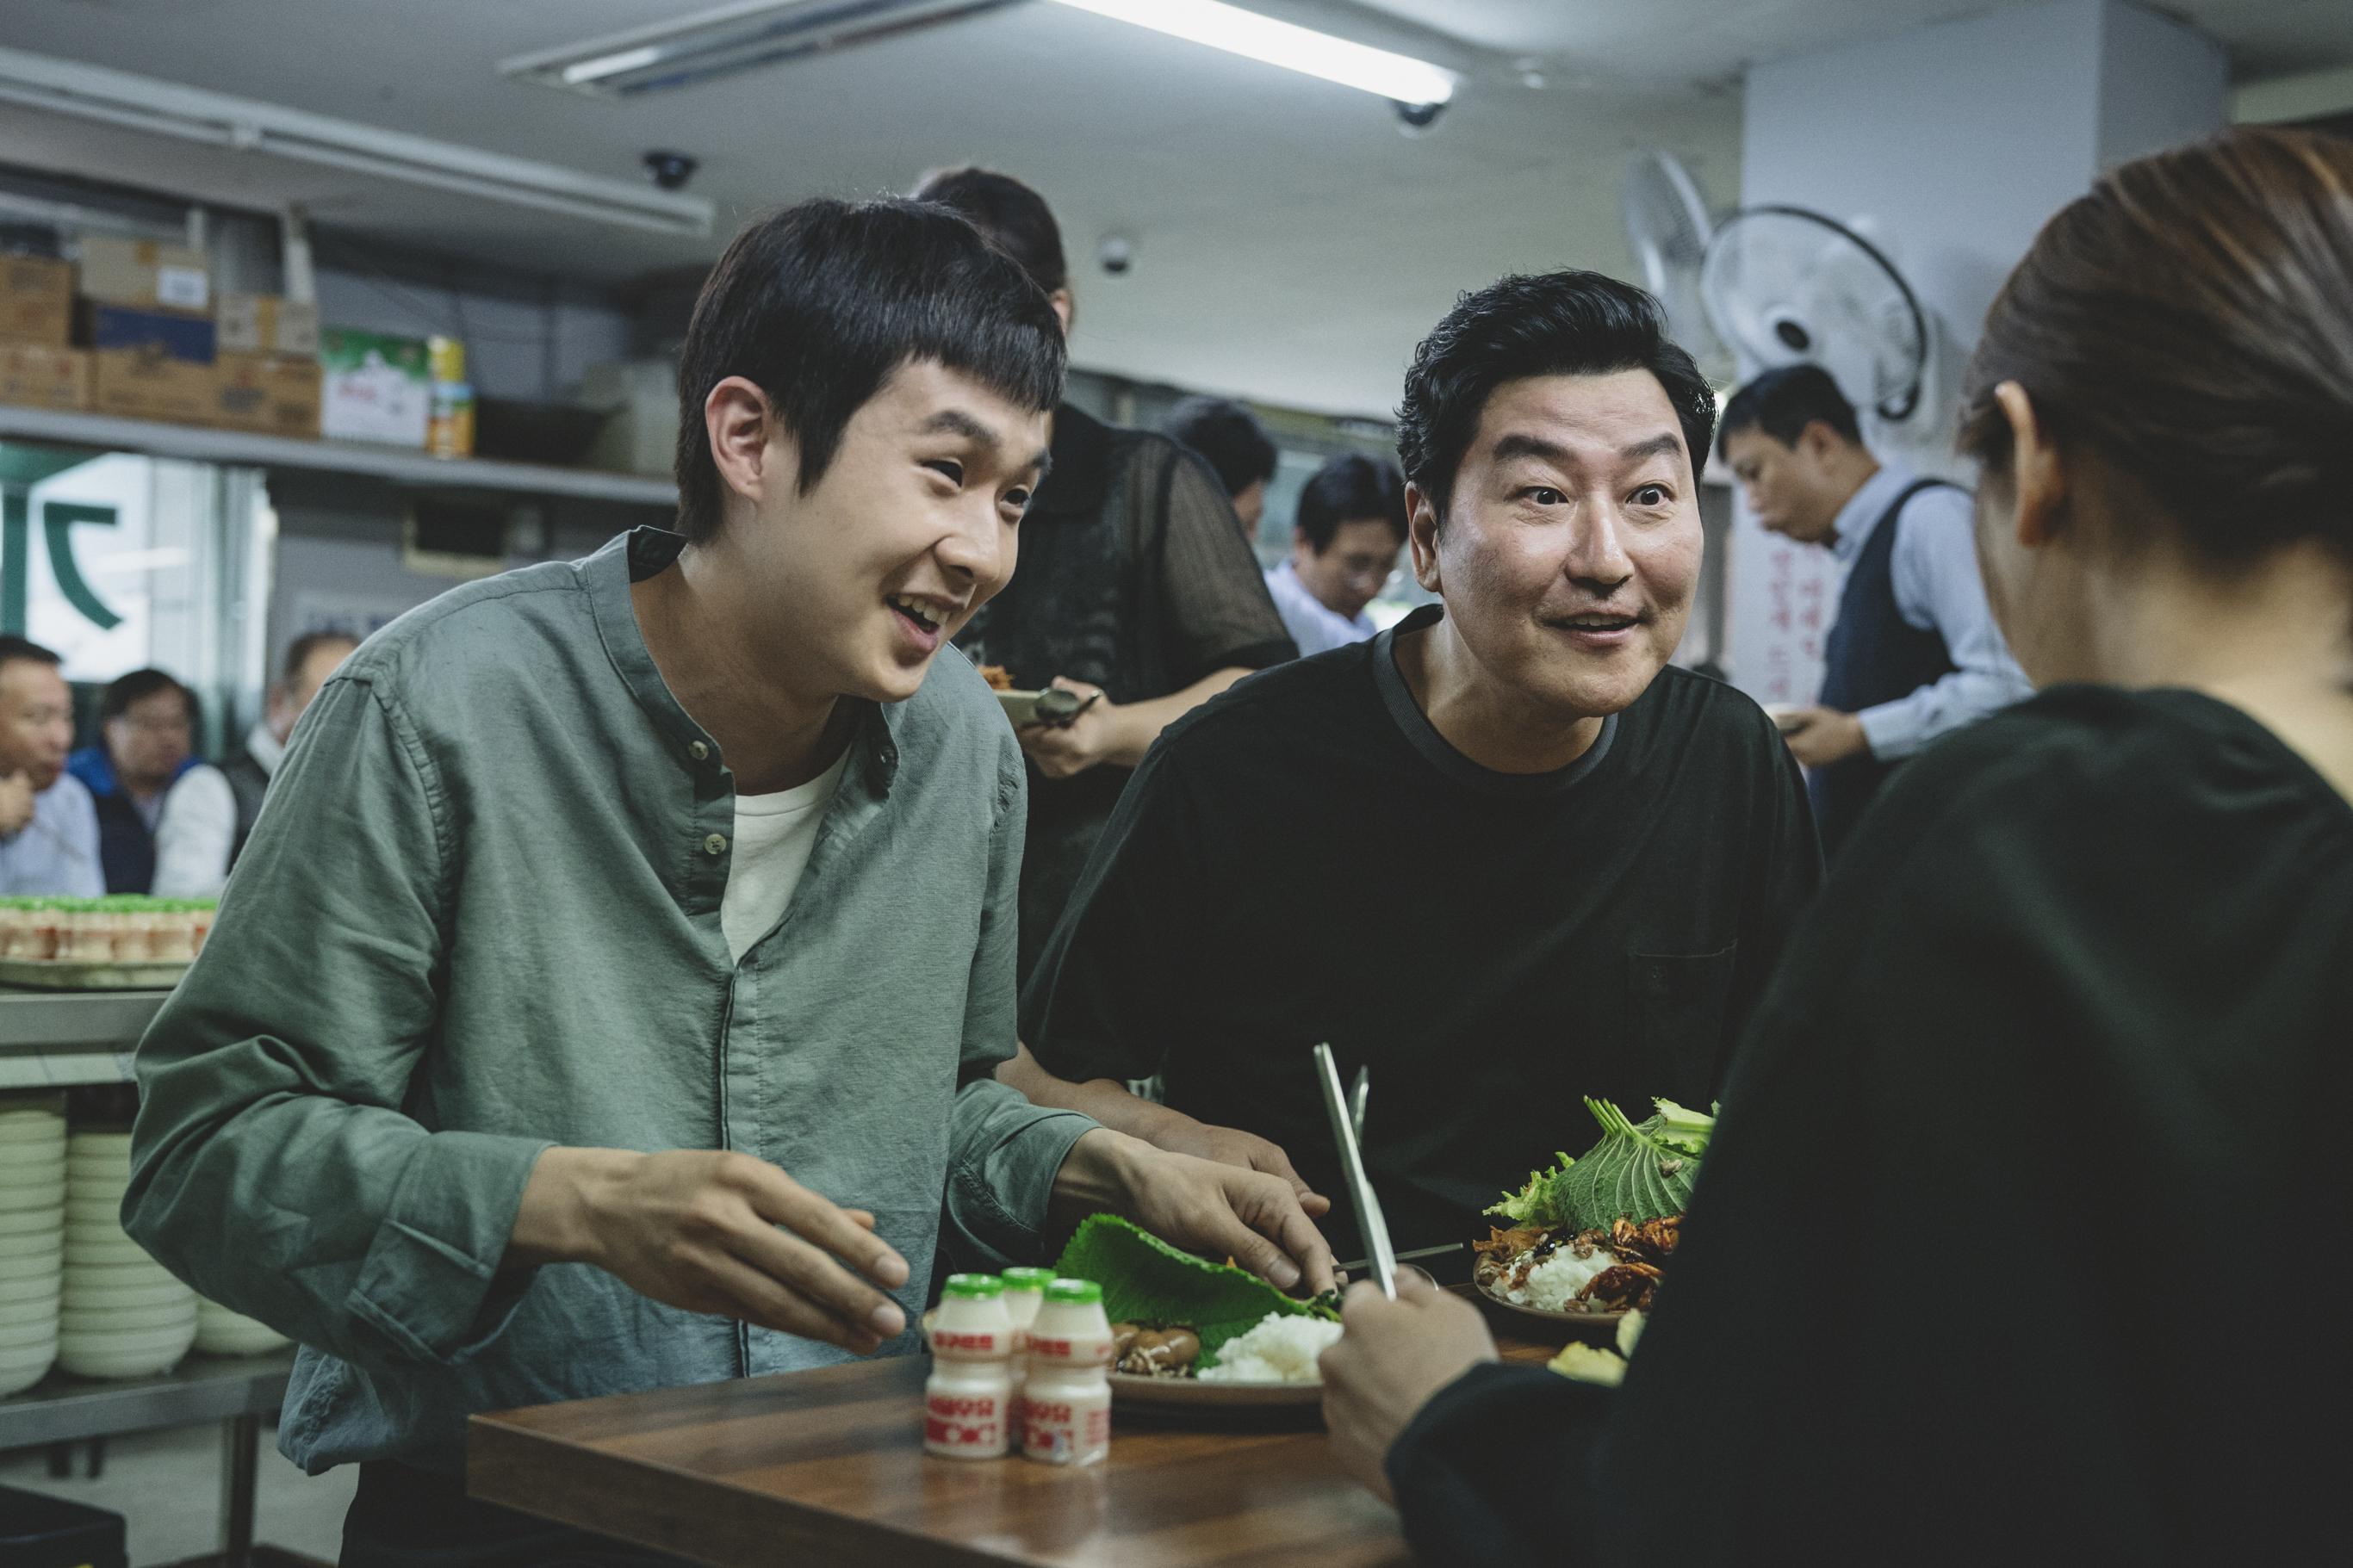 A kis család (Choi Woo-shik, Song Kang-ho, Jang Hye-jin és Park So-dam)